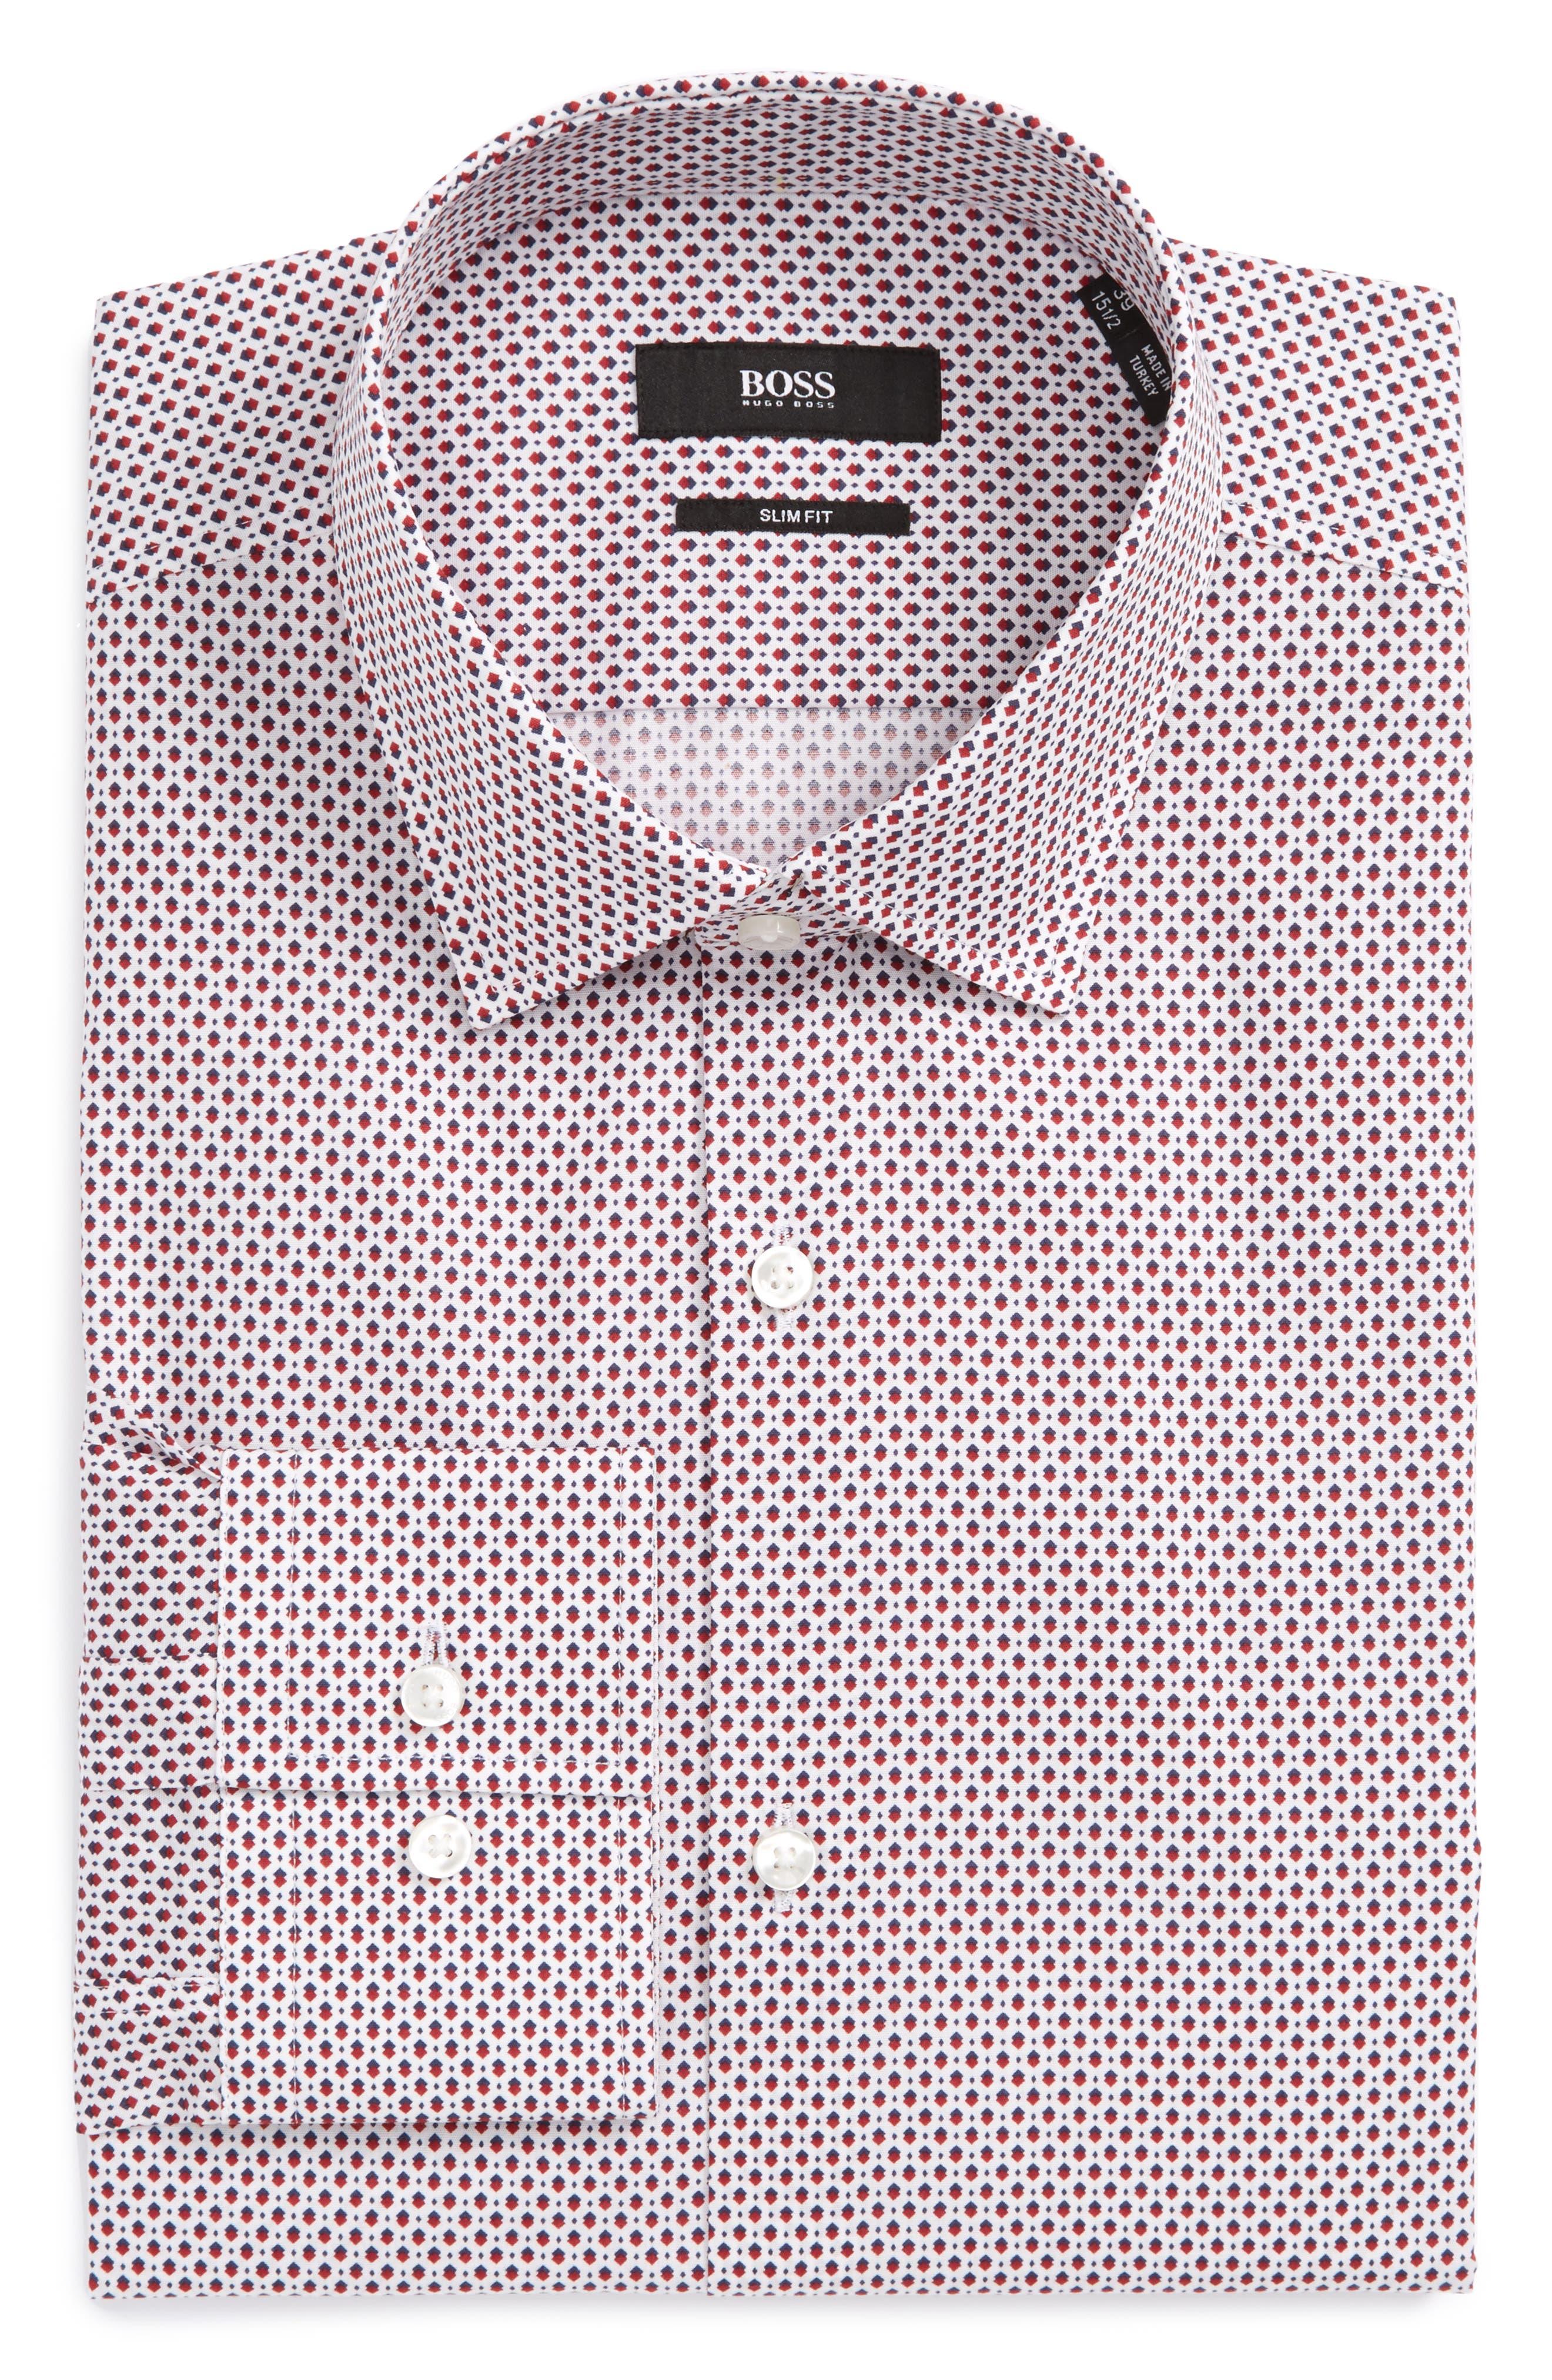 Alternate Image 1 Selected - BOSS Jenno Slim Fit Print Dress Shirt